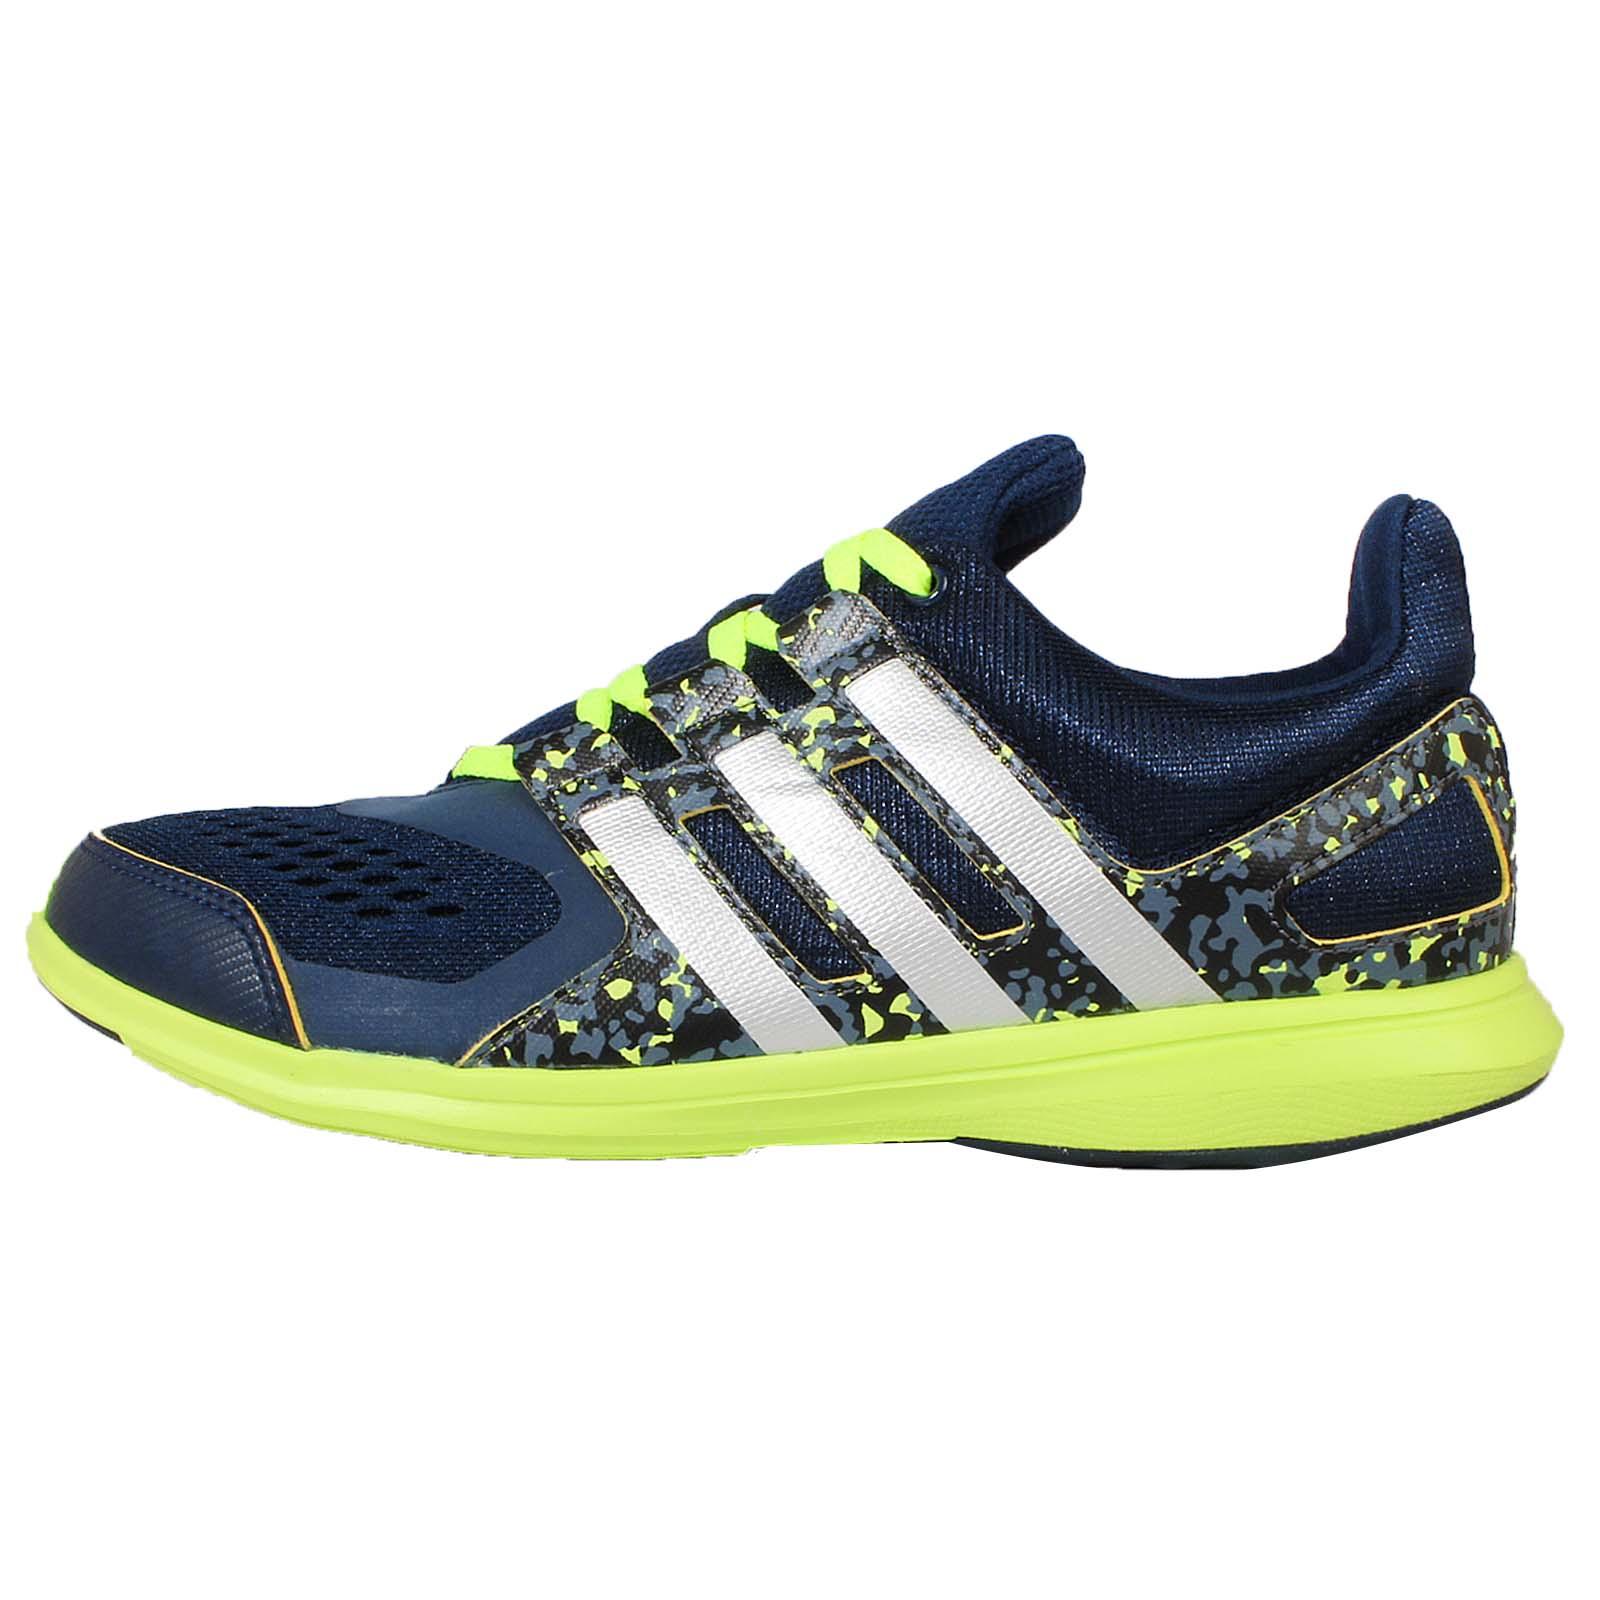 adidas kids running